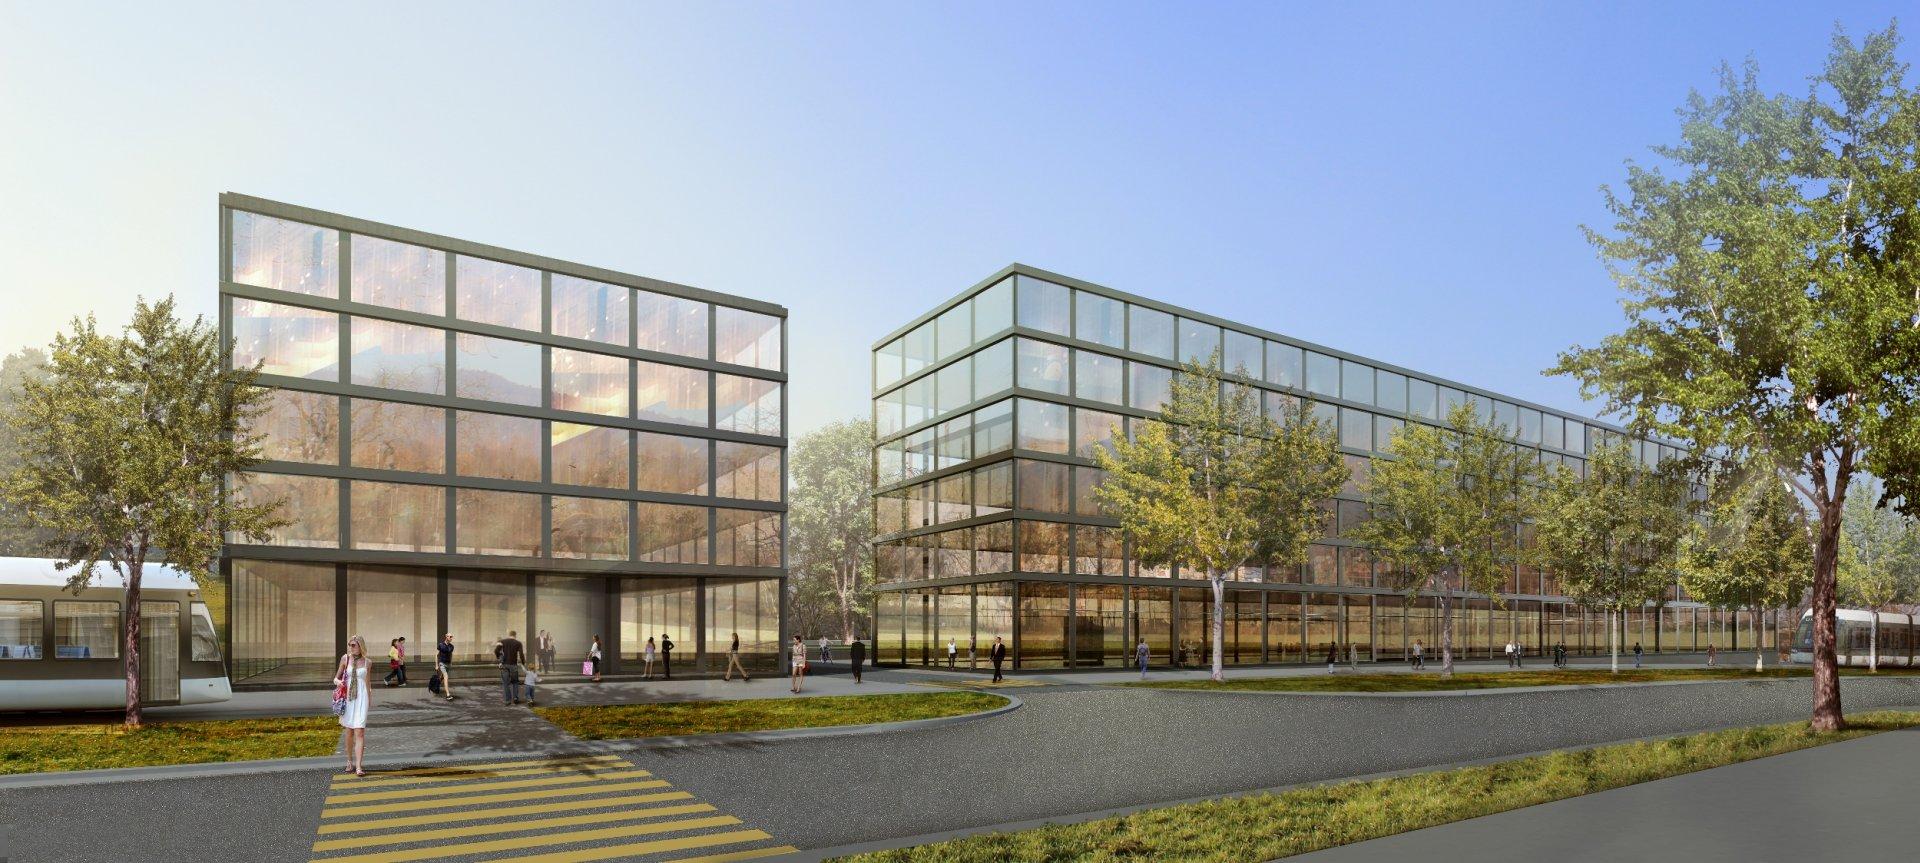 HRMP AG - Haus 5 Hilton Spreitenbach